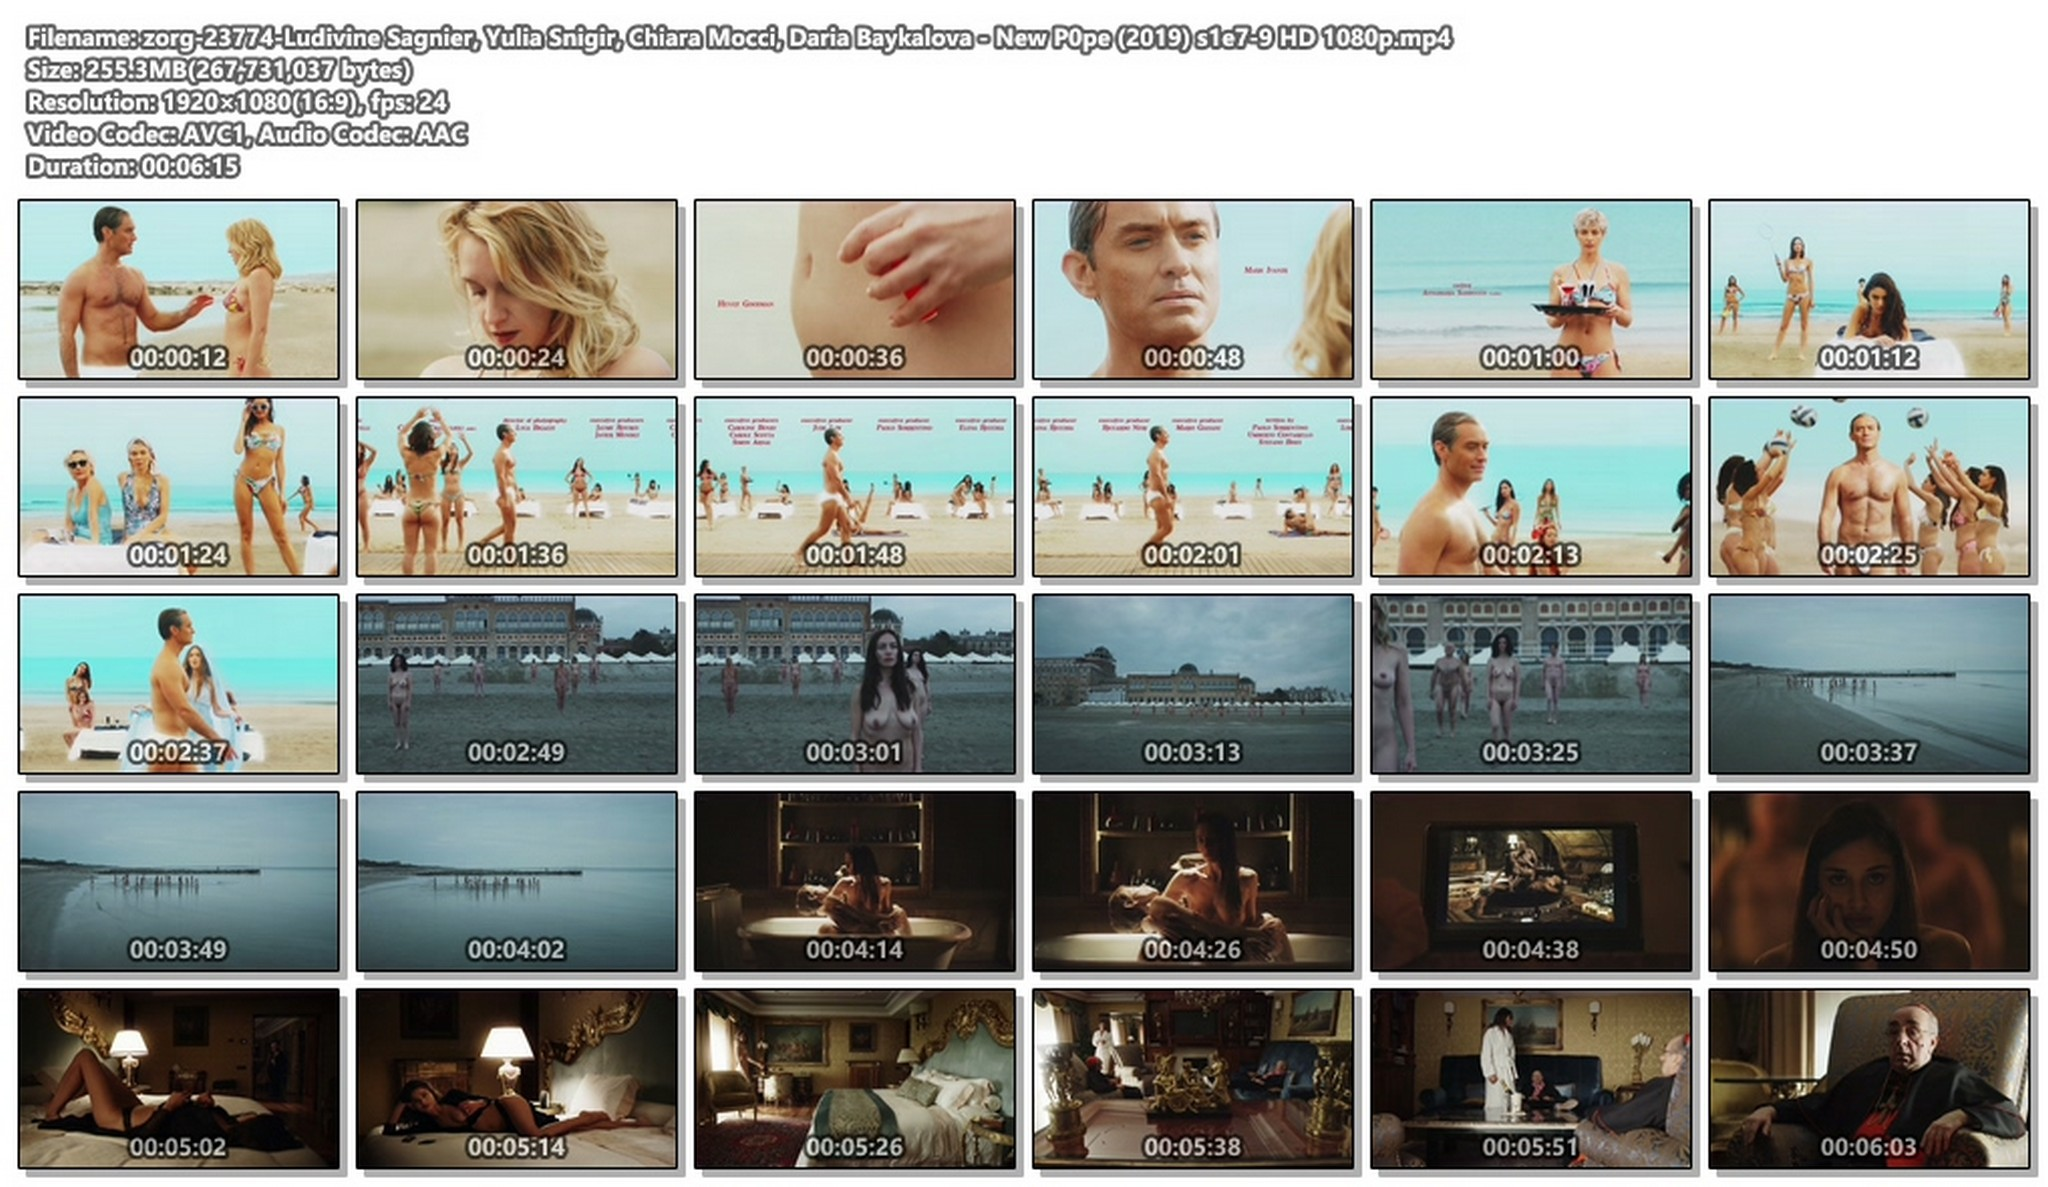 Ludivine Sagnier nude full frontal Yulia Snigir, Chiara Mocci, Daria Baykalova nude - New P0pe (2019) s1e7-9 HD 1080p (1)